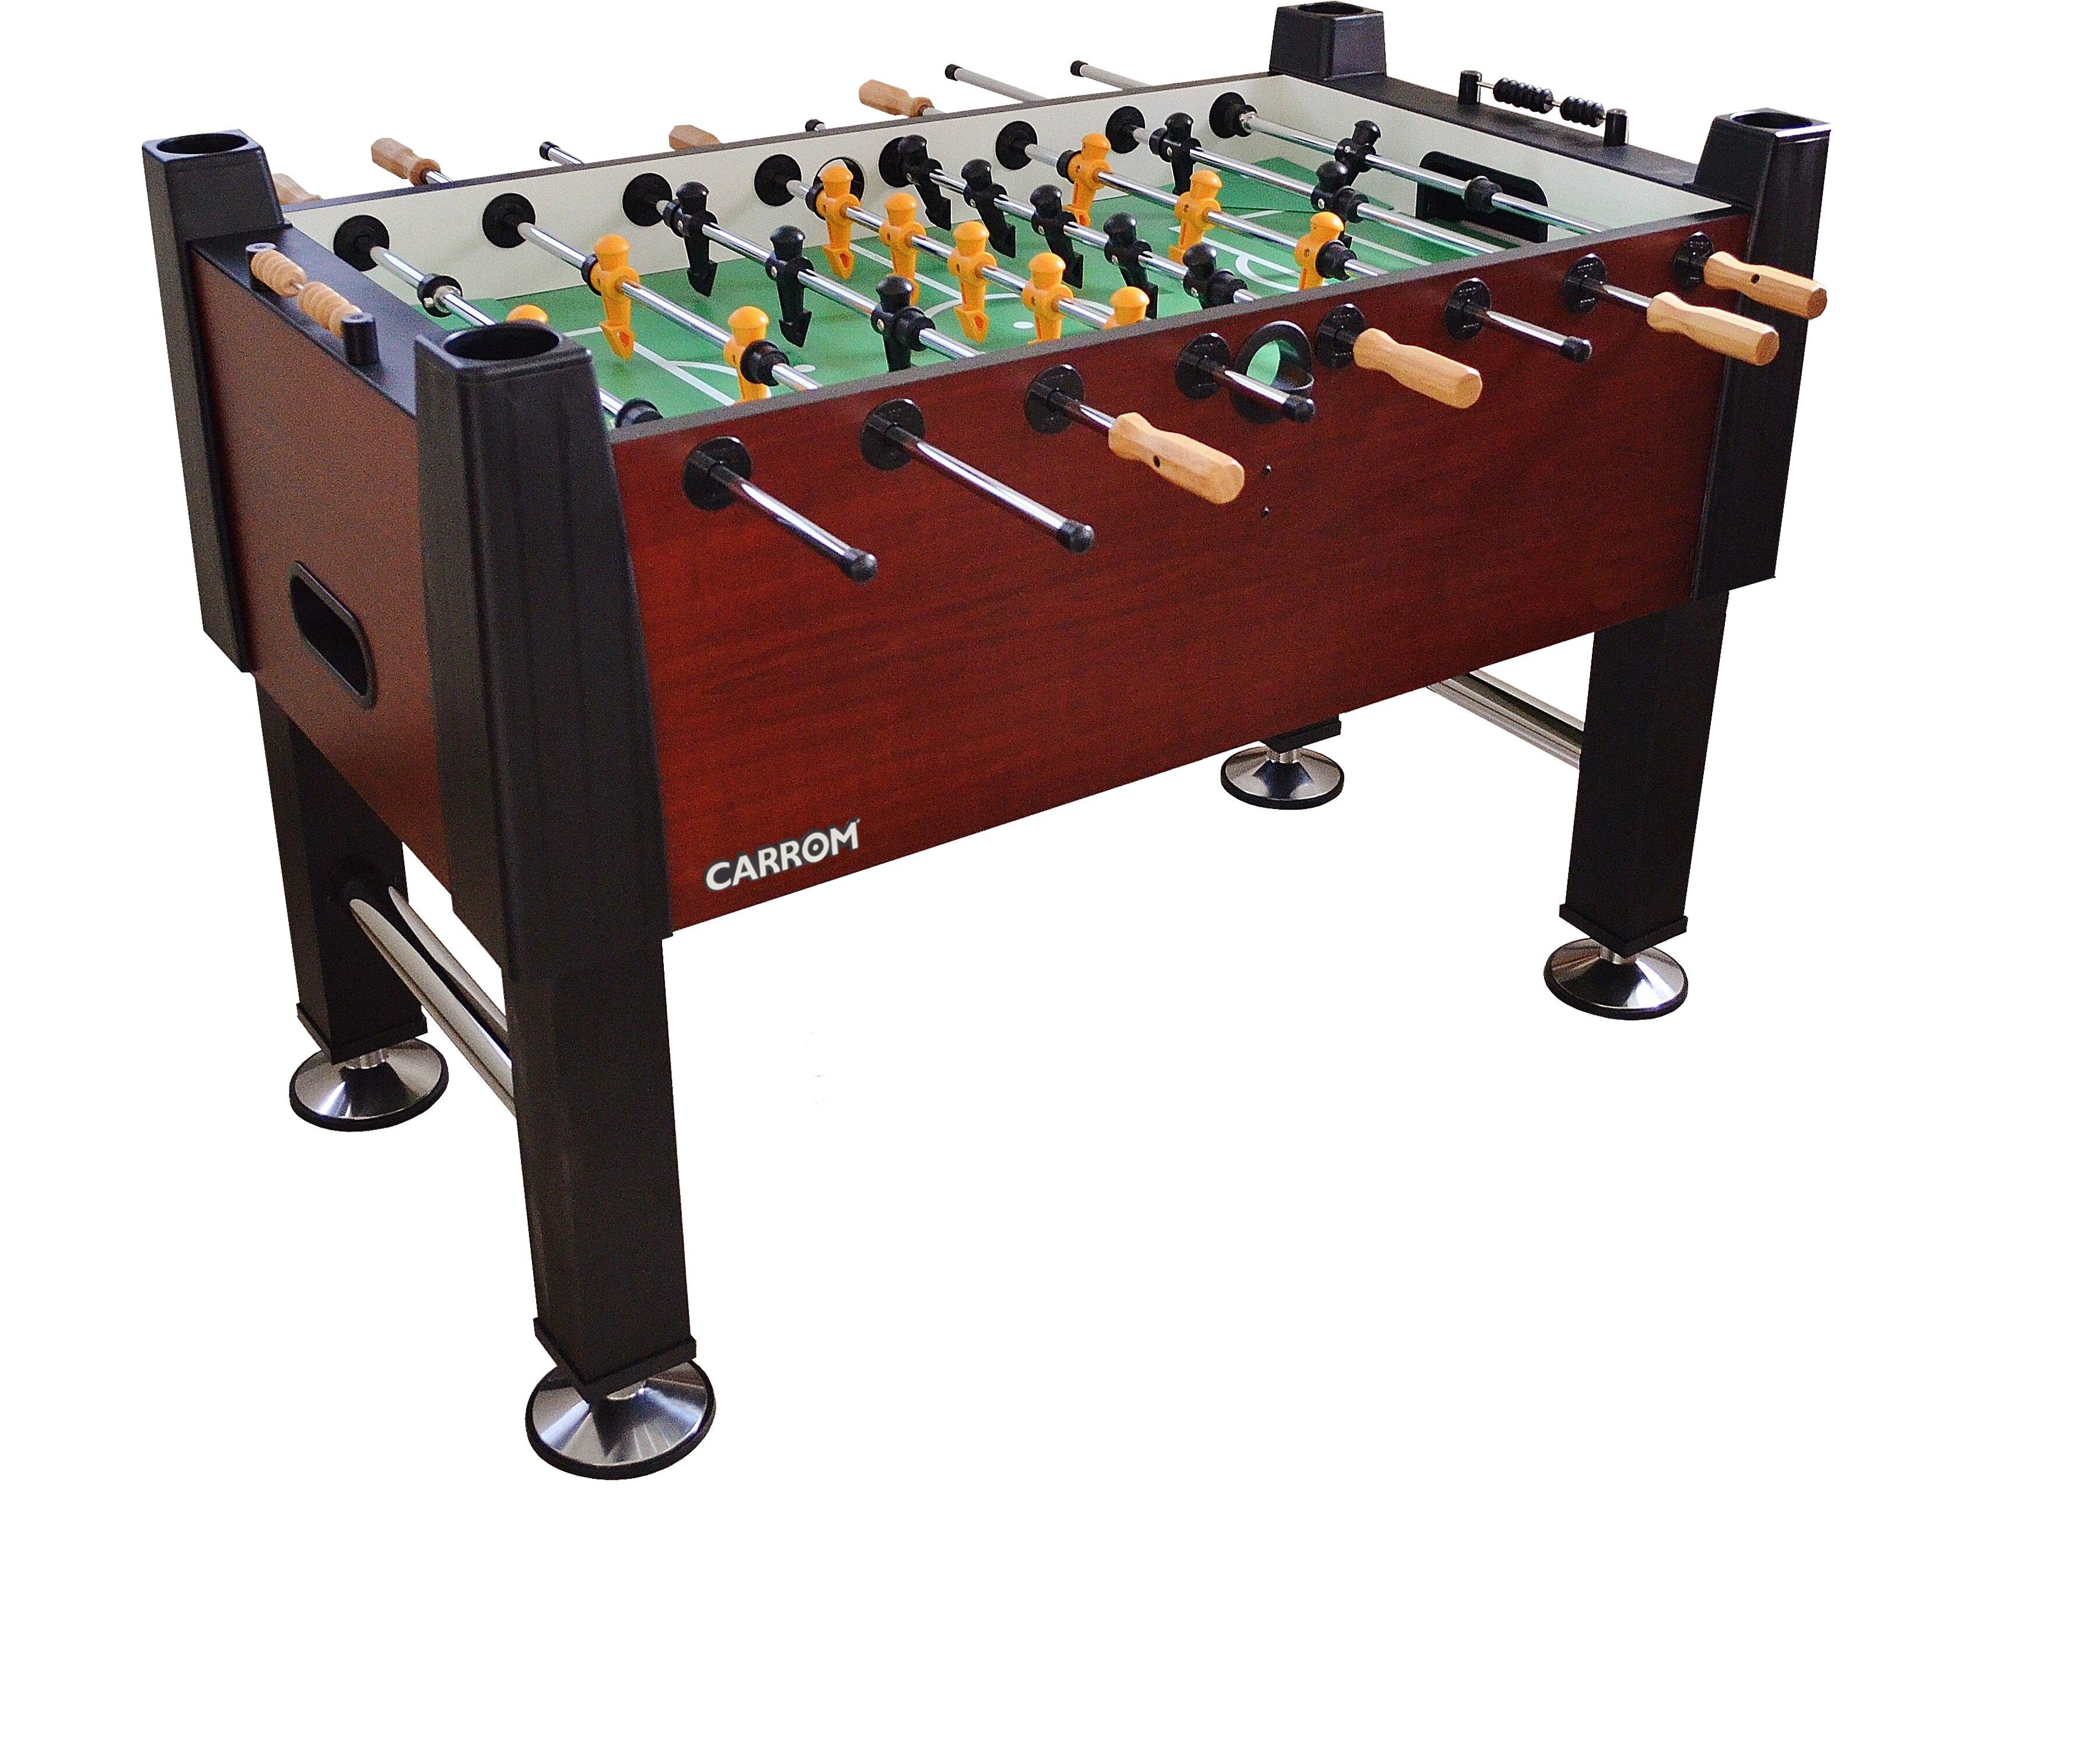 Carrom Signature Foosball Game Table | Wayfair